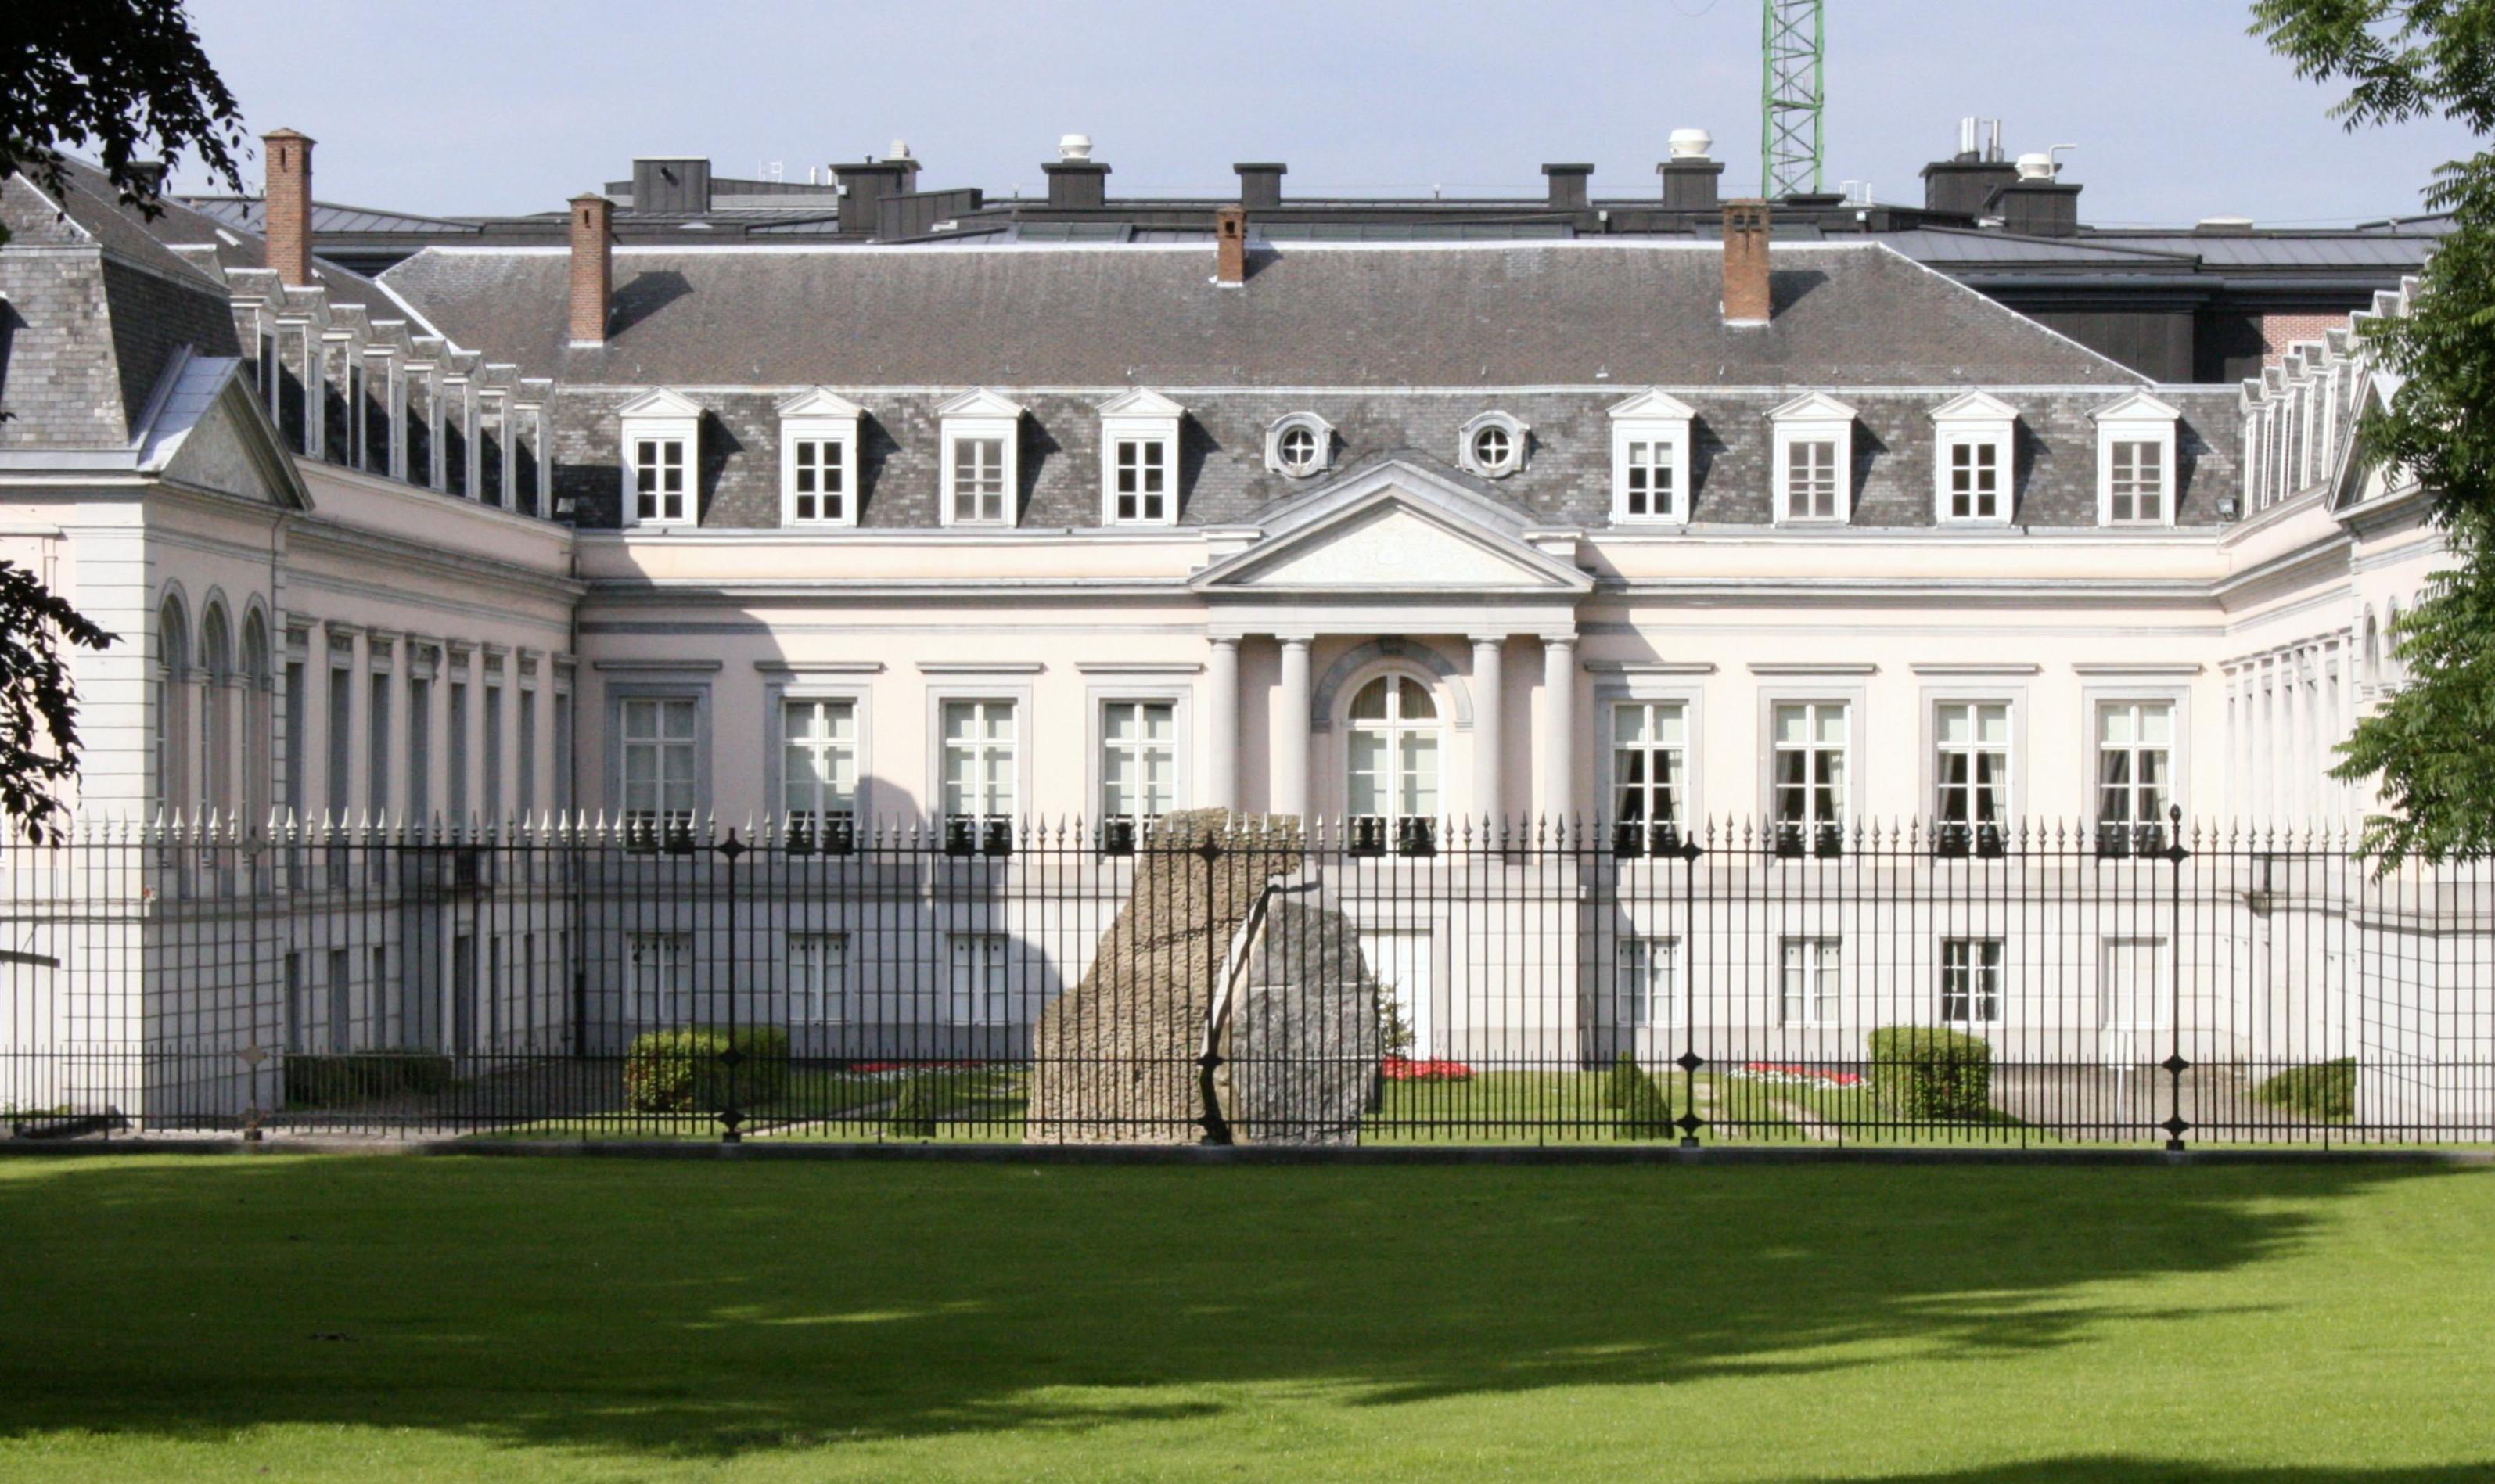 File:Bruxelles Palais d'Egmont (cropped).jpg - Wikimedia Commons